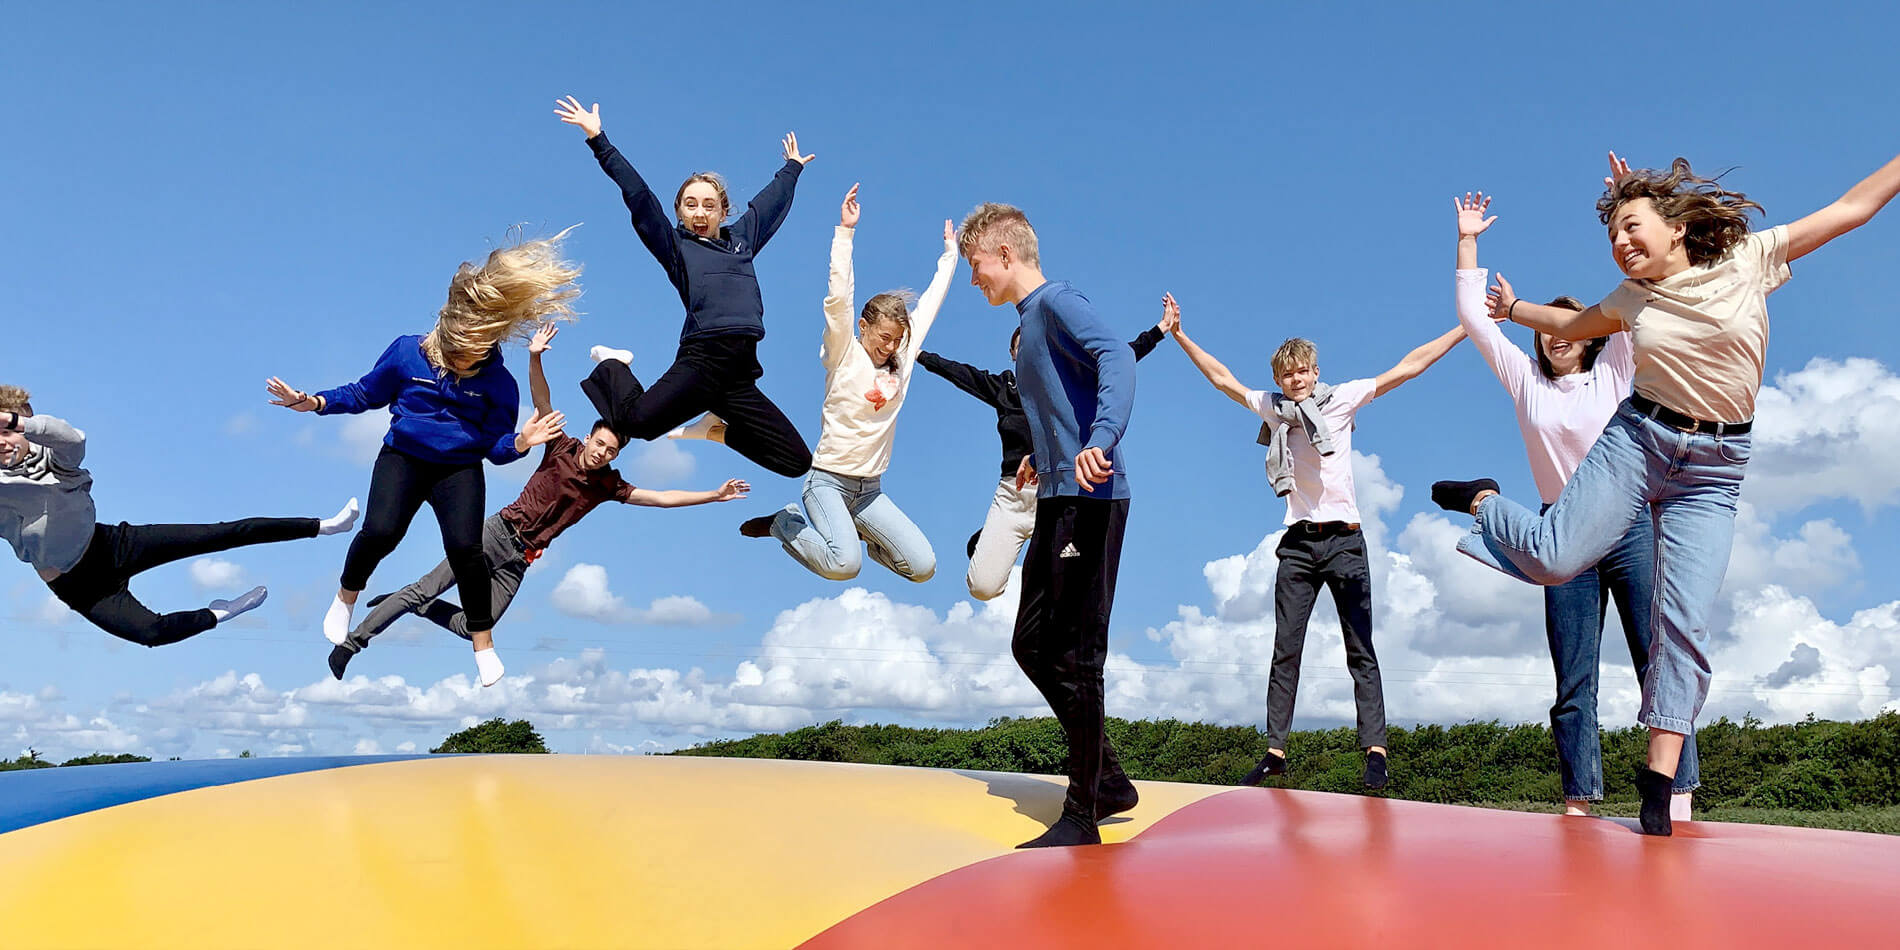 Ranum International Summer School & Camps